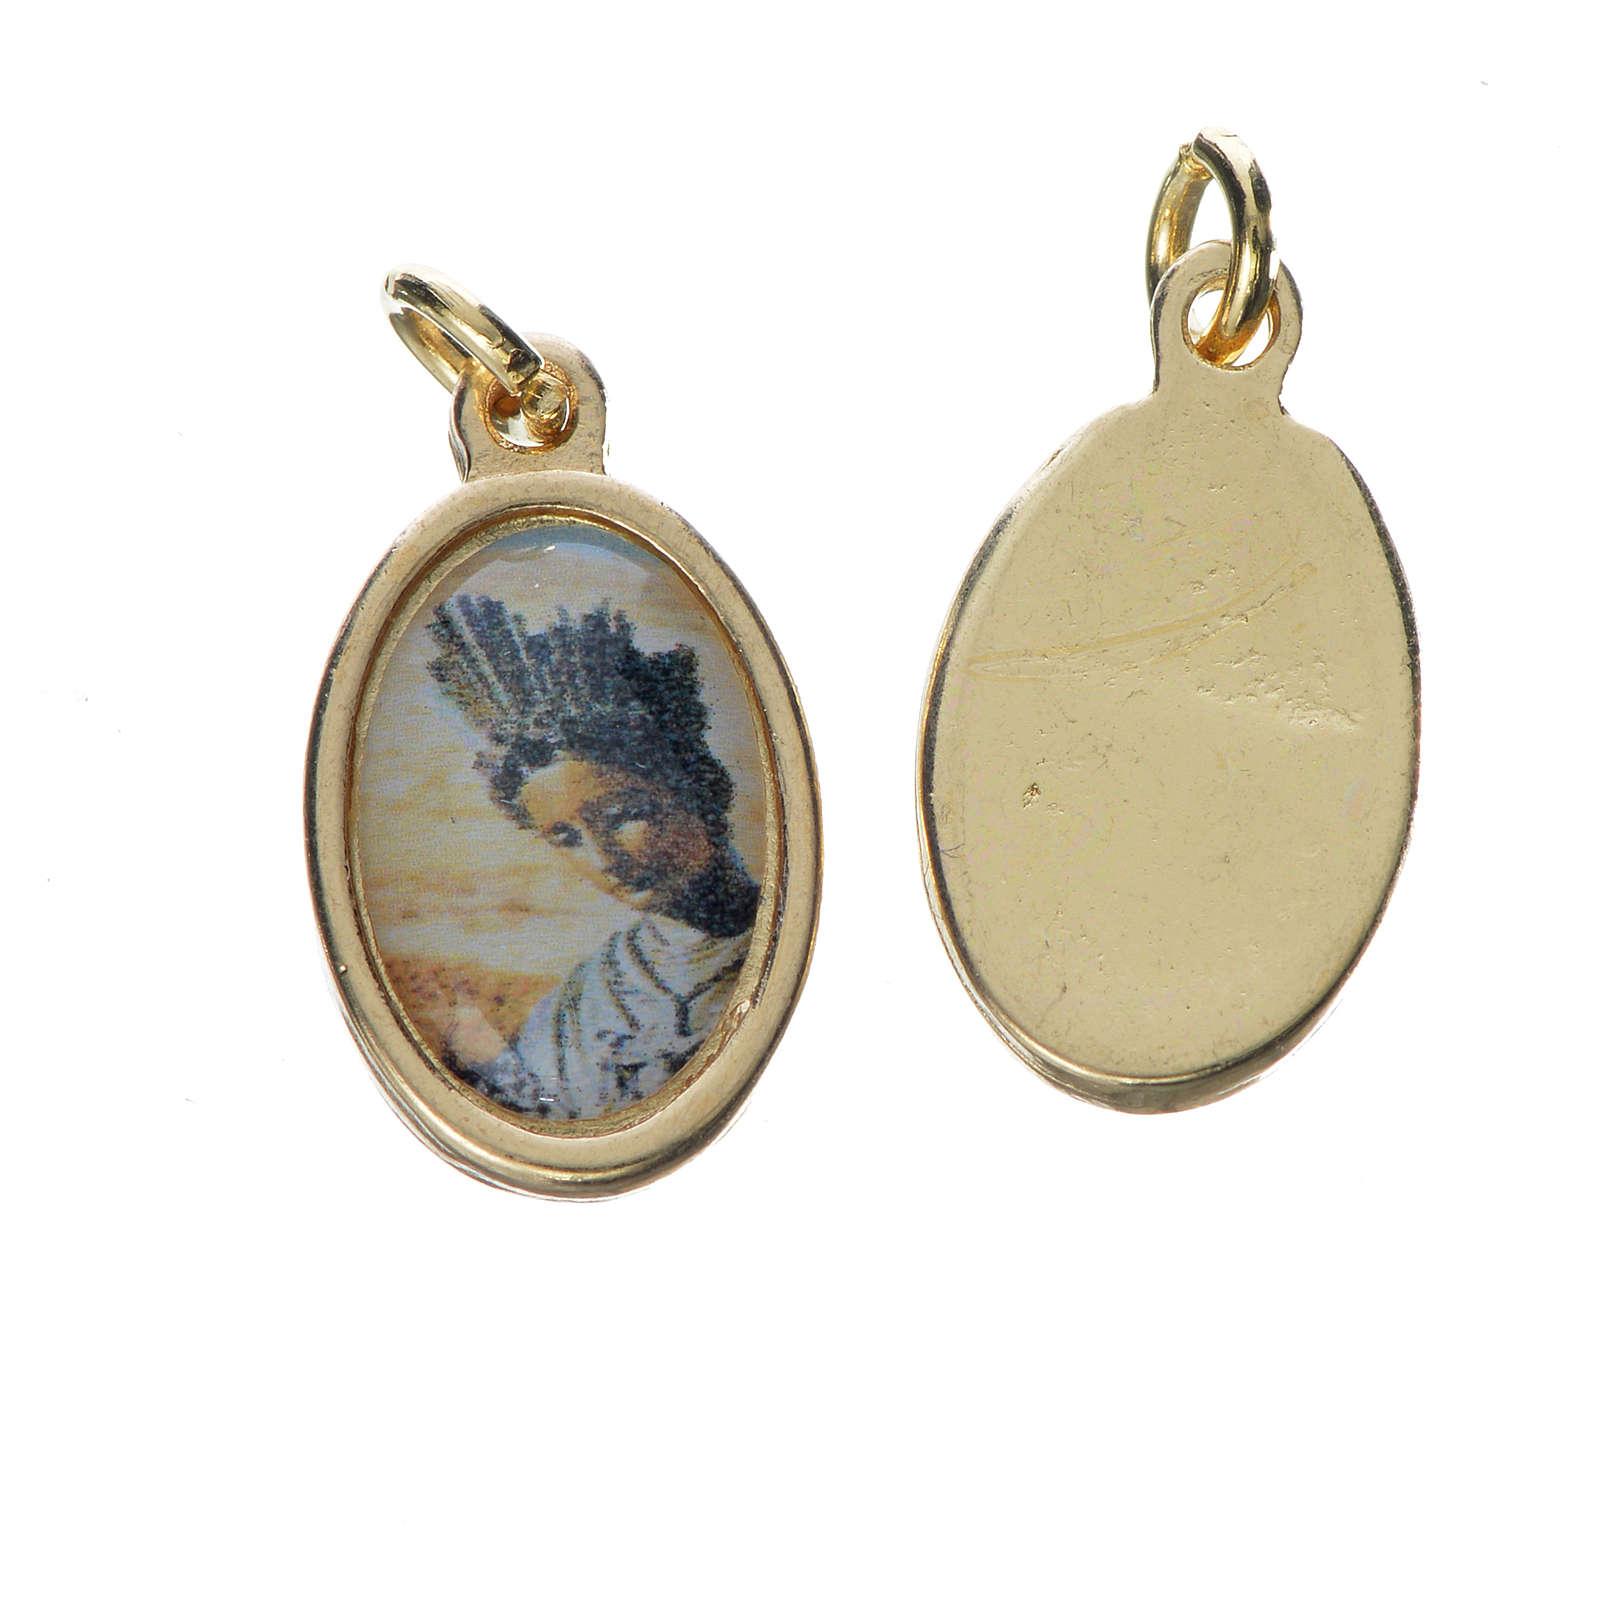 Notre Dame de la Salette medal in golden metal, 1.5cm 4